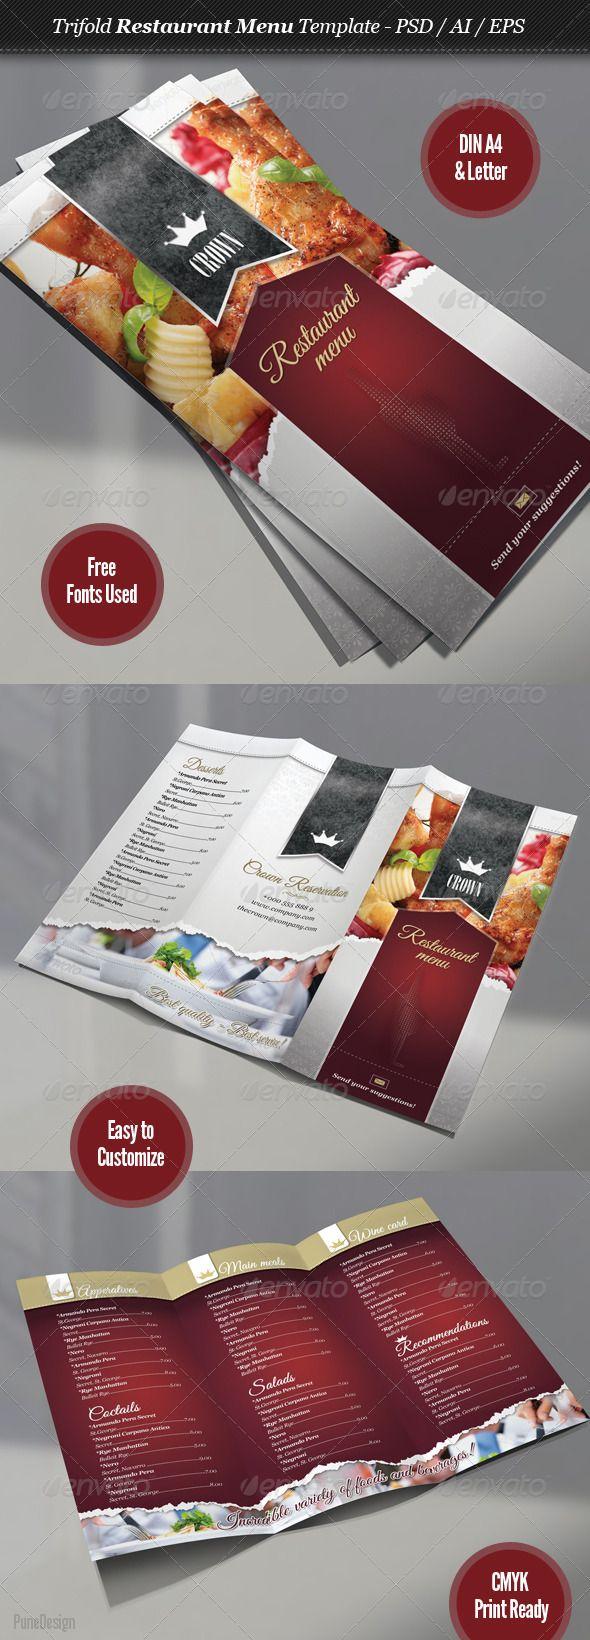 24 best menu design images on pinterest editorial design print templates trifold restaurant menu template graphicriver pronofoot35fo Choice Image